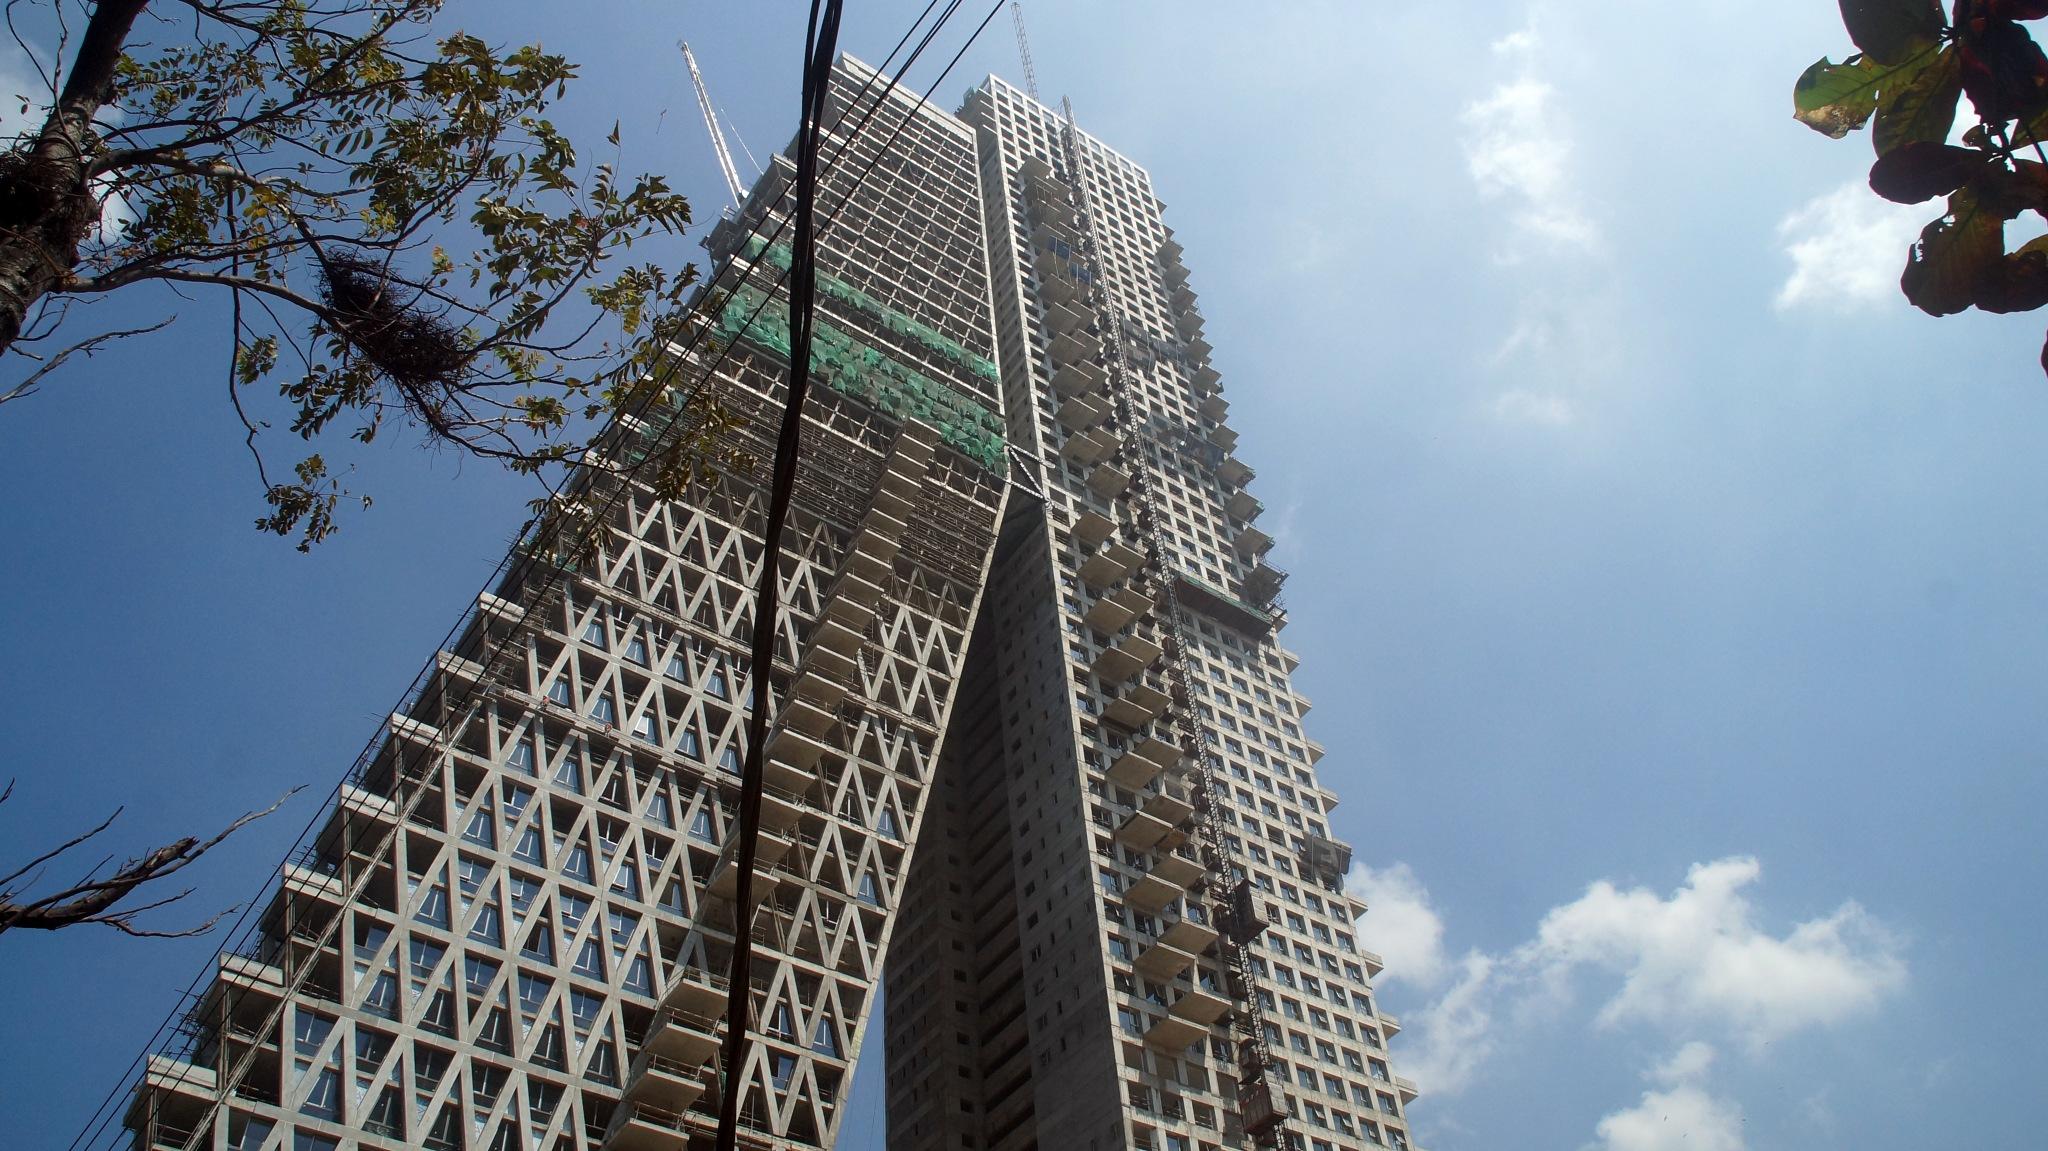 Skyscrape in progress, Colombo, Sri Lanka 2018 by lars.erlandsson.9